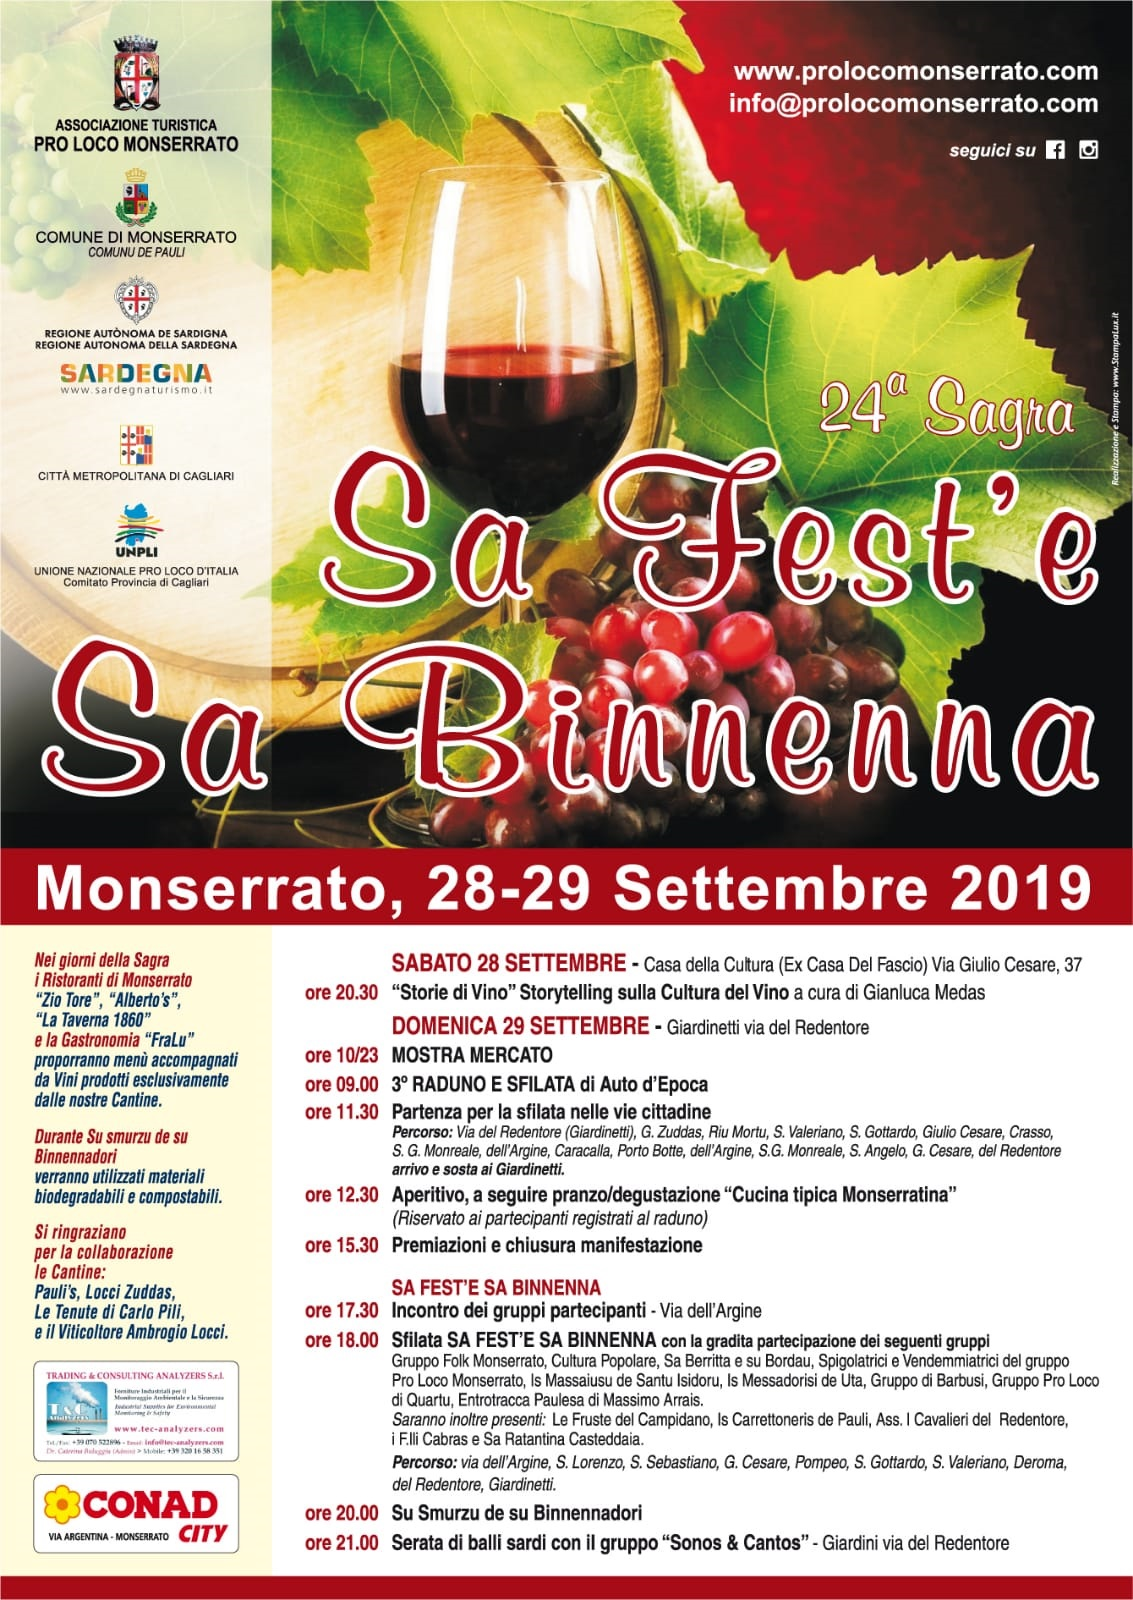 locandina-sa-feste-sa-binnenna-2019